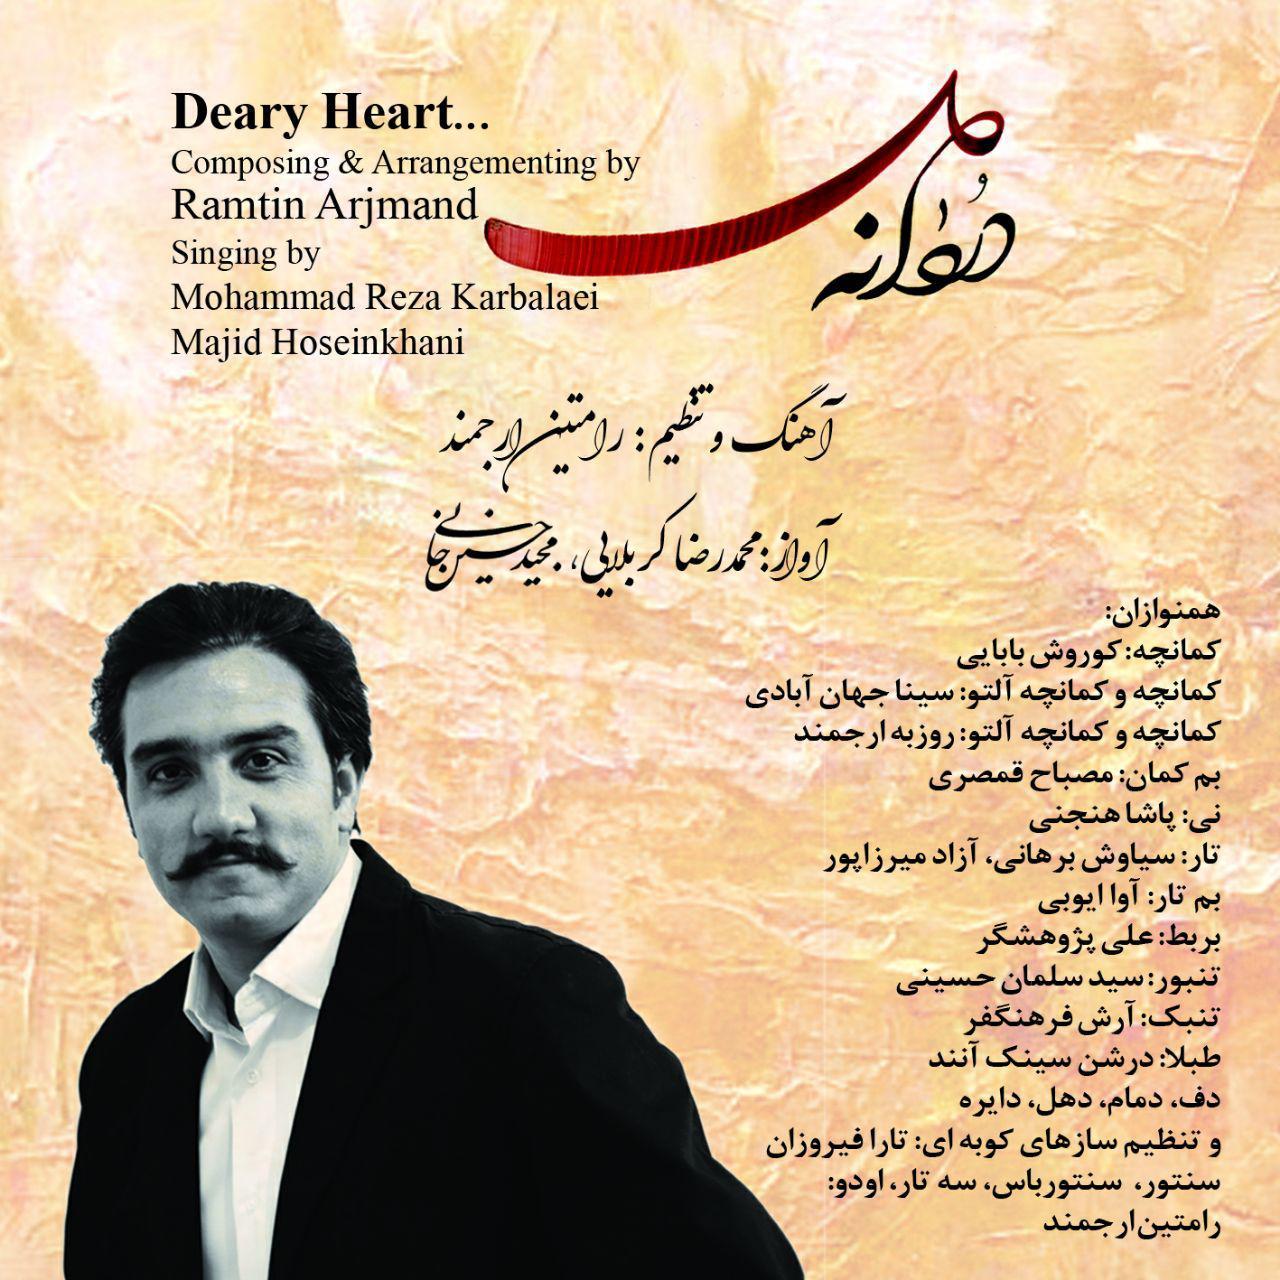 آلبوم «دردانه دل» منتشر شد